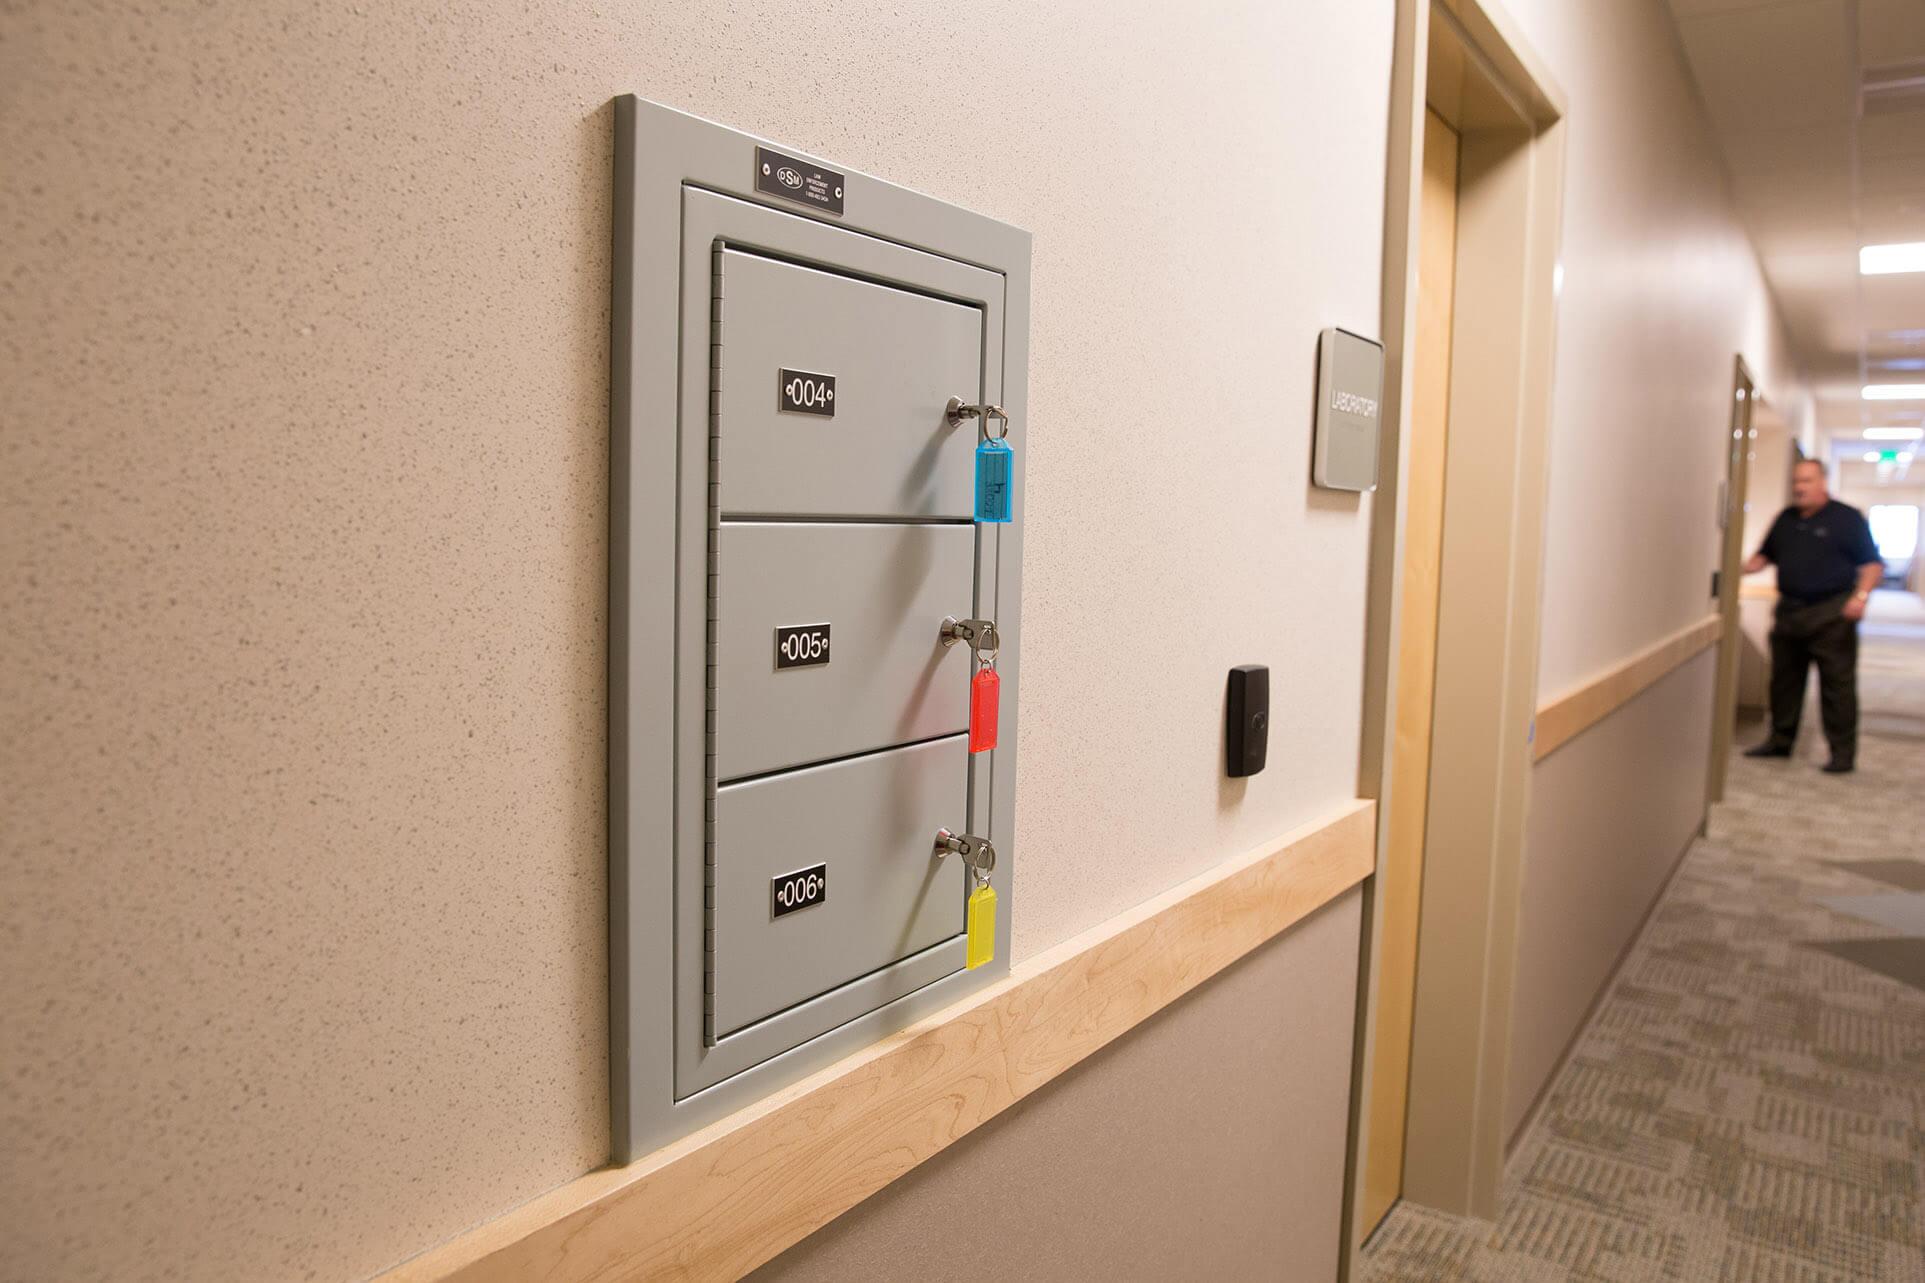 Sally port gun locker mounted flush with wall inside police department